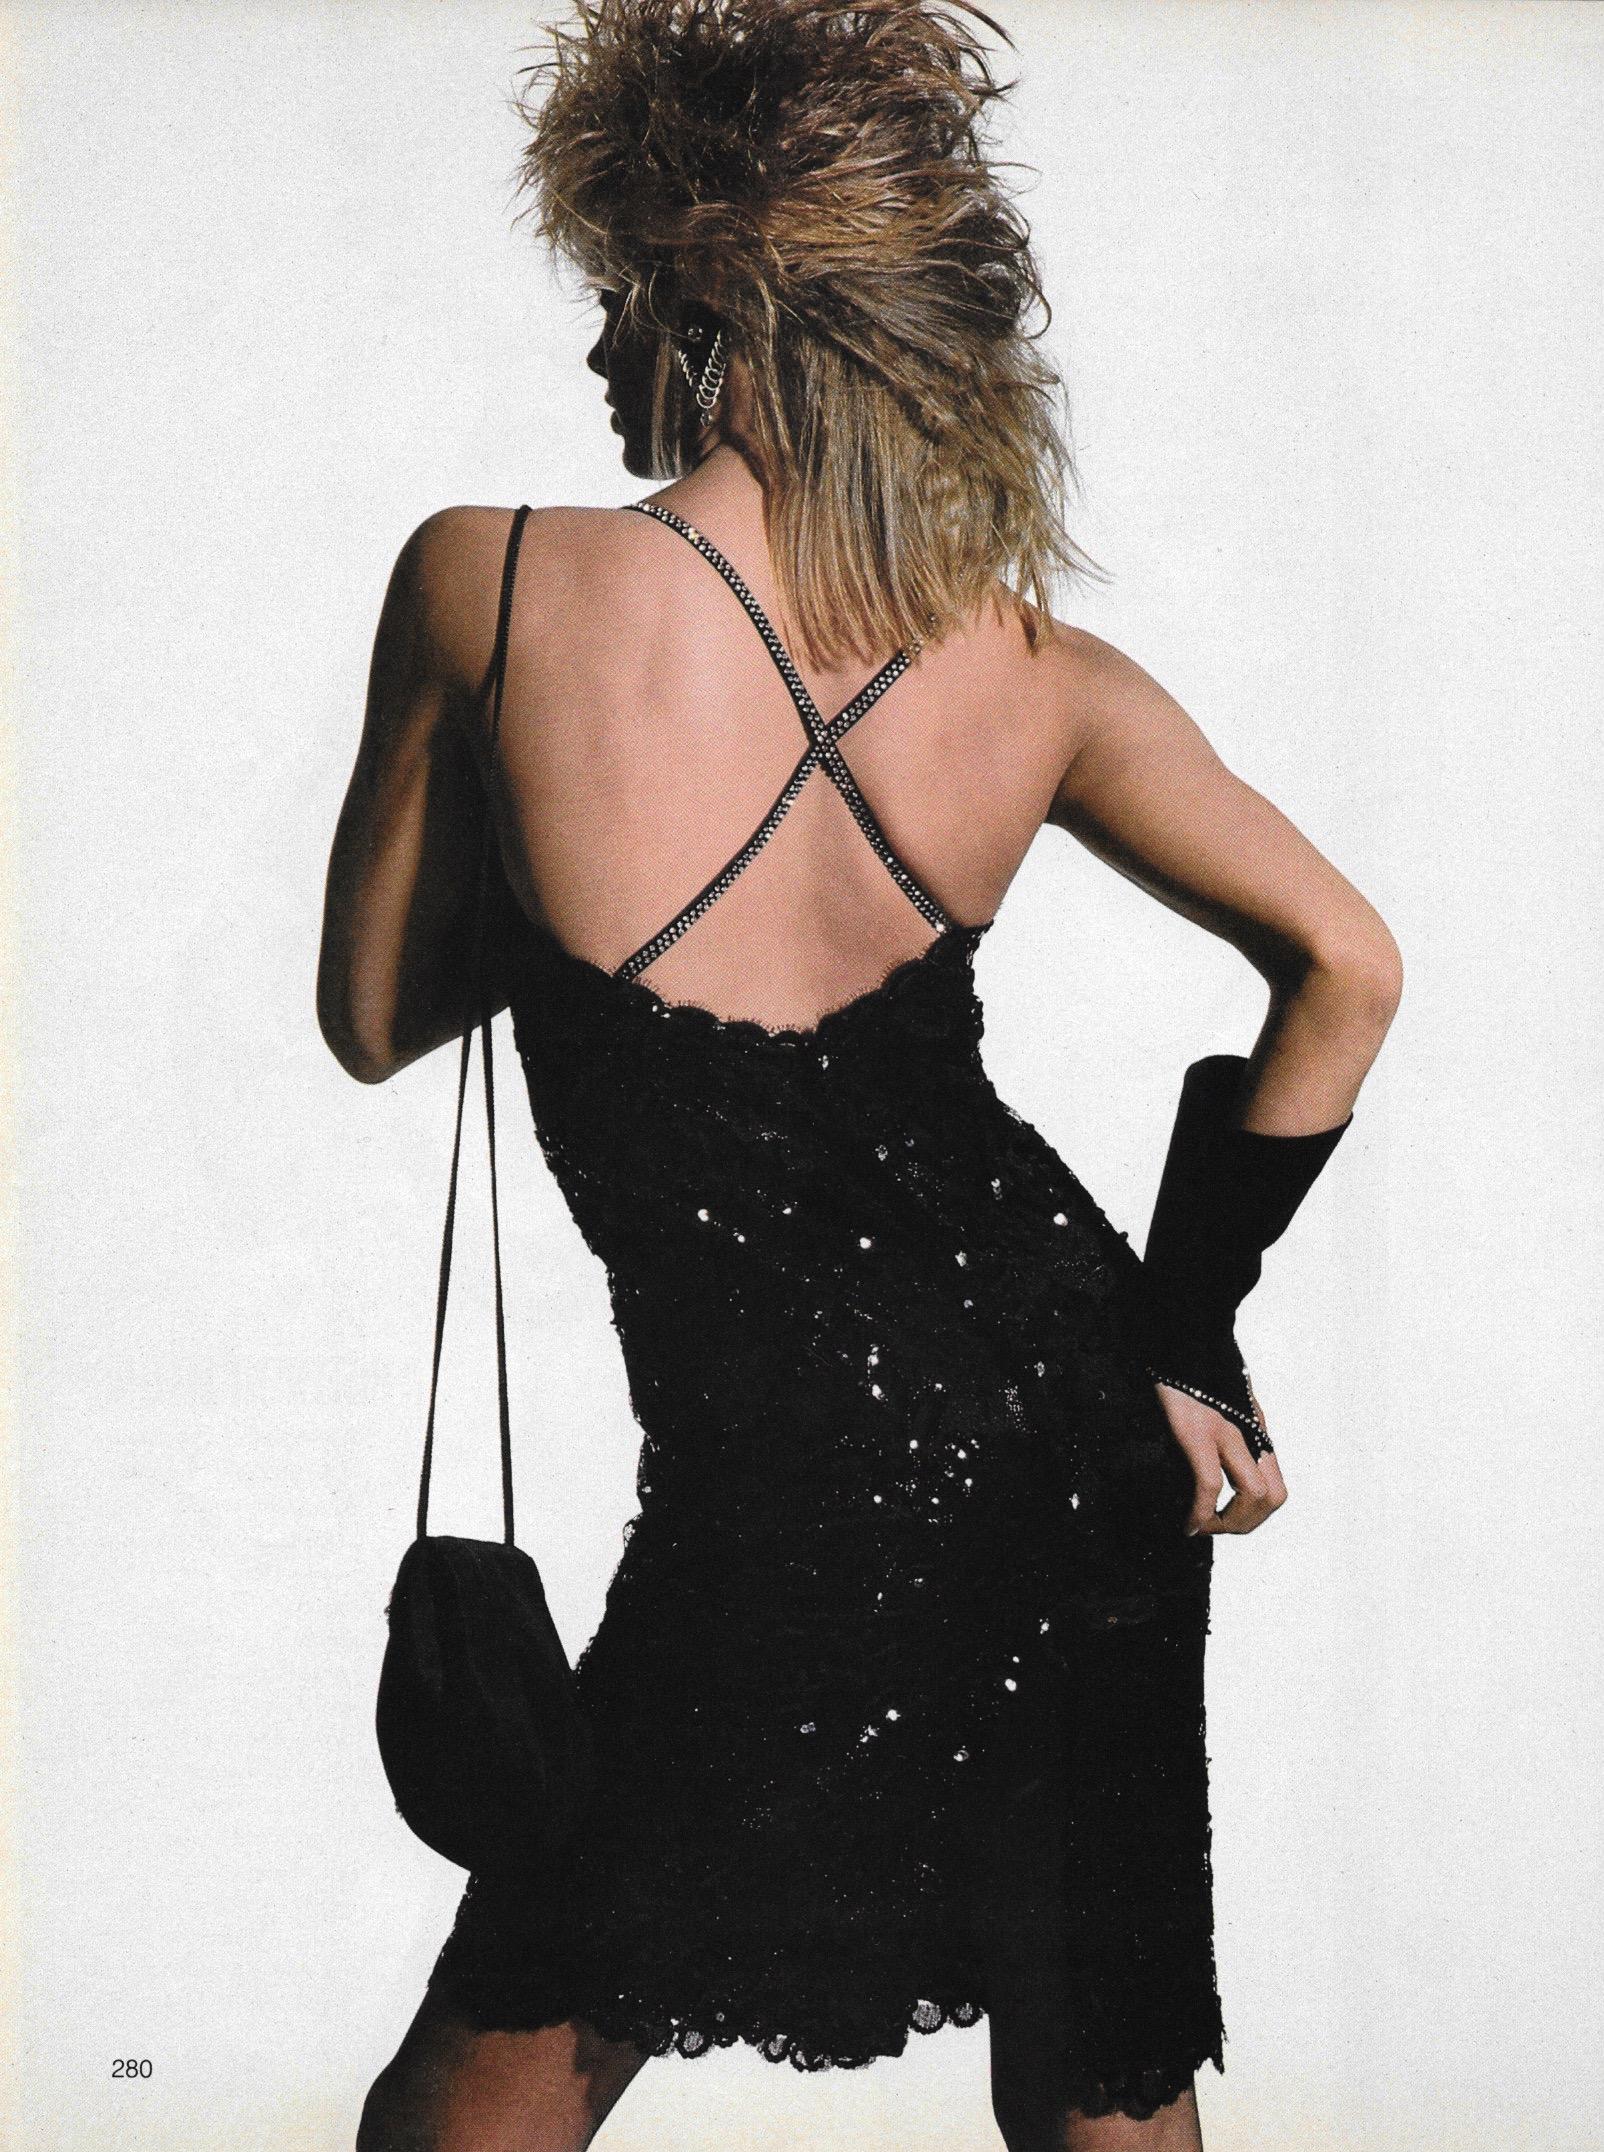 Penn_Vogue_US_June_1984_05.jpg